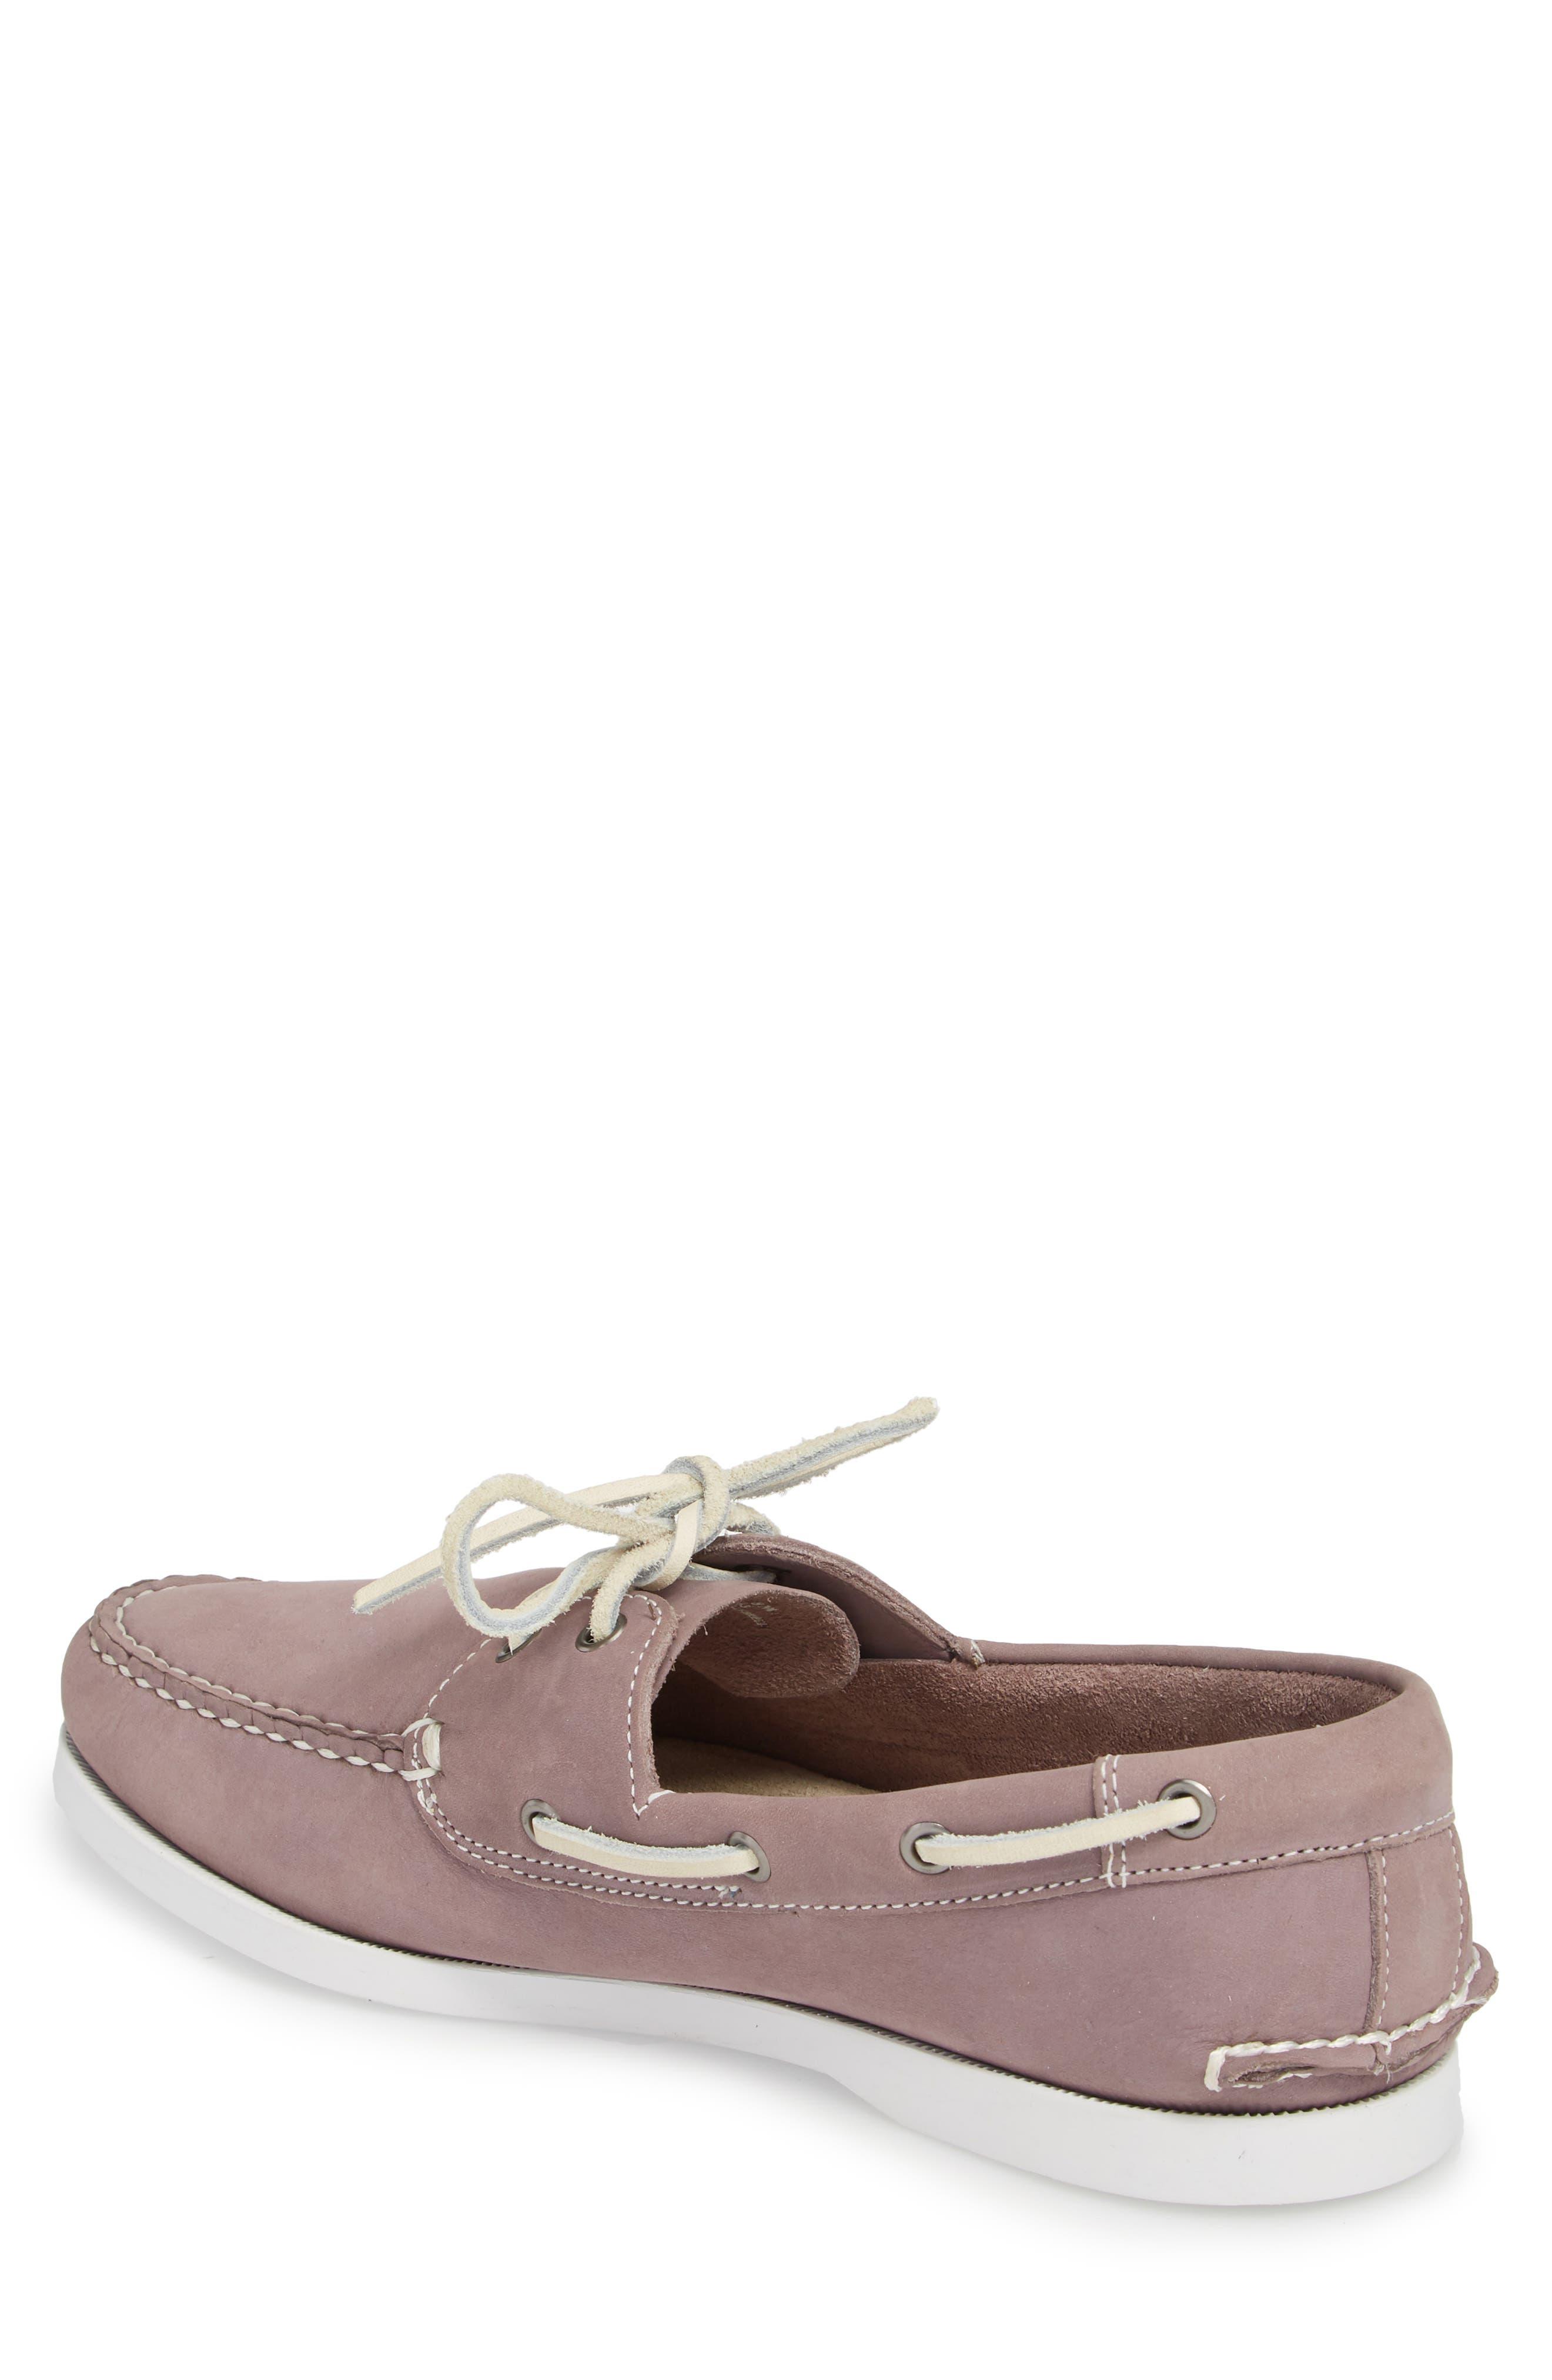 Pacific Boat Shoe,                             Alternate thumbnail 2, color,                             Lavender Nubuck